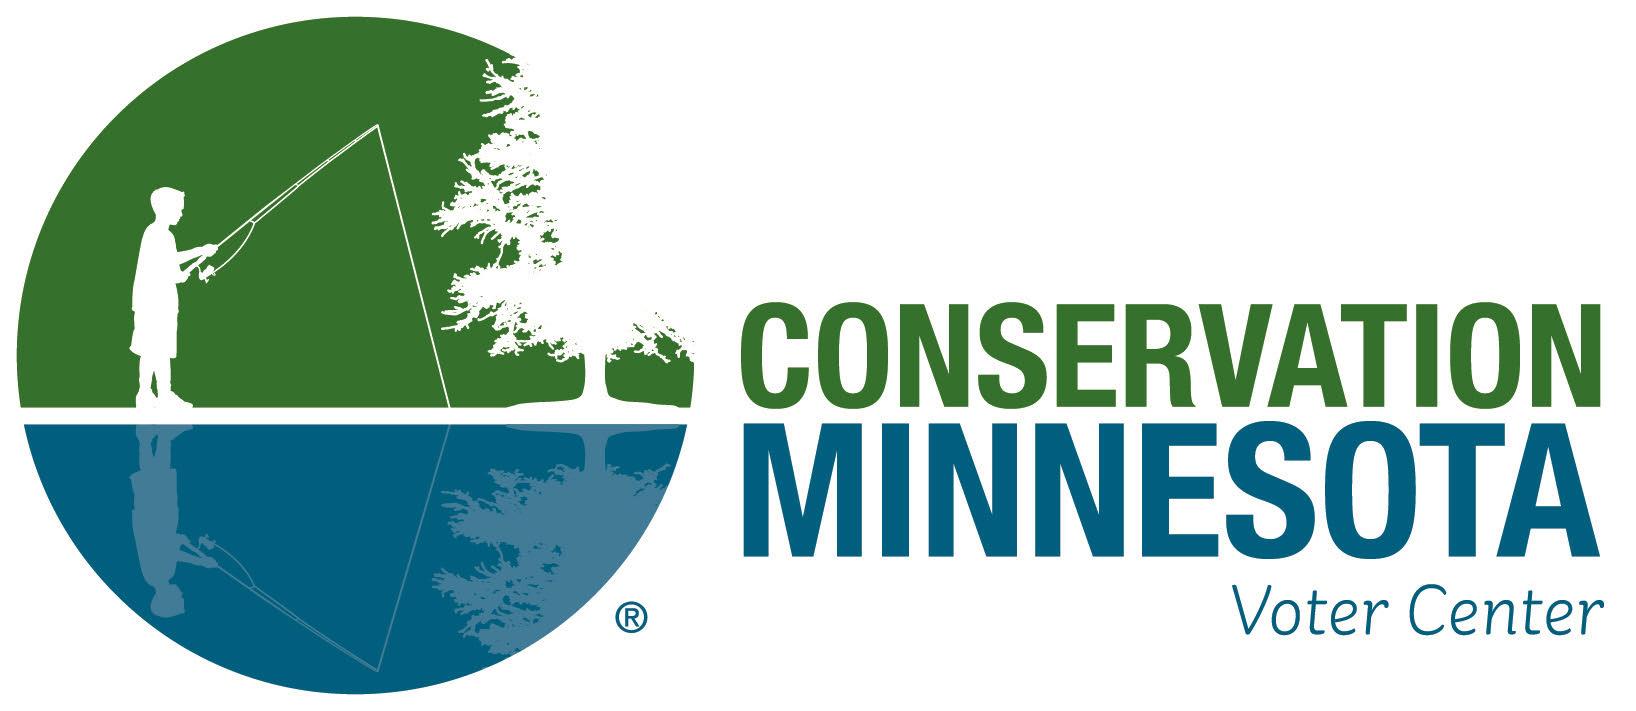 ConservationMN.jpg